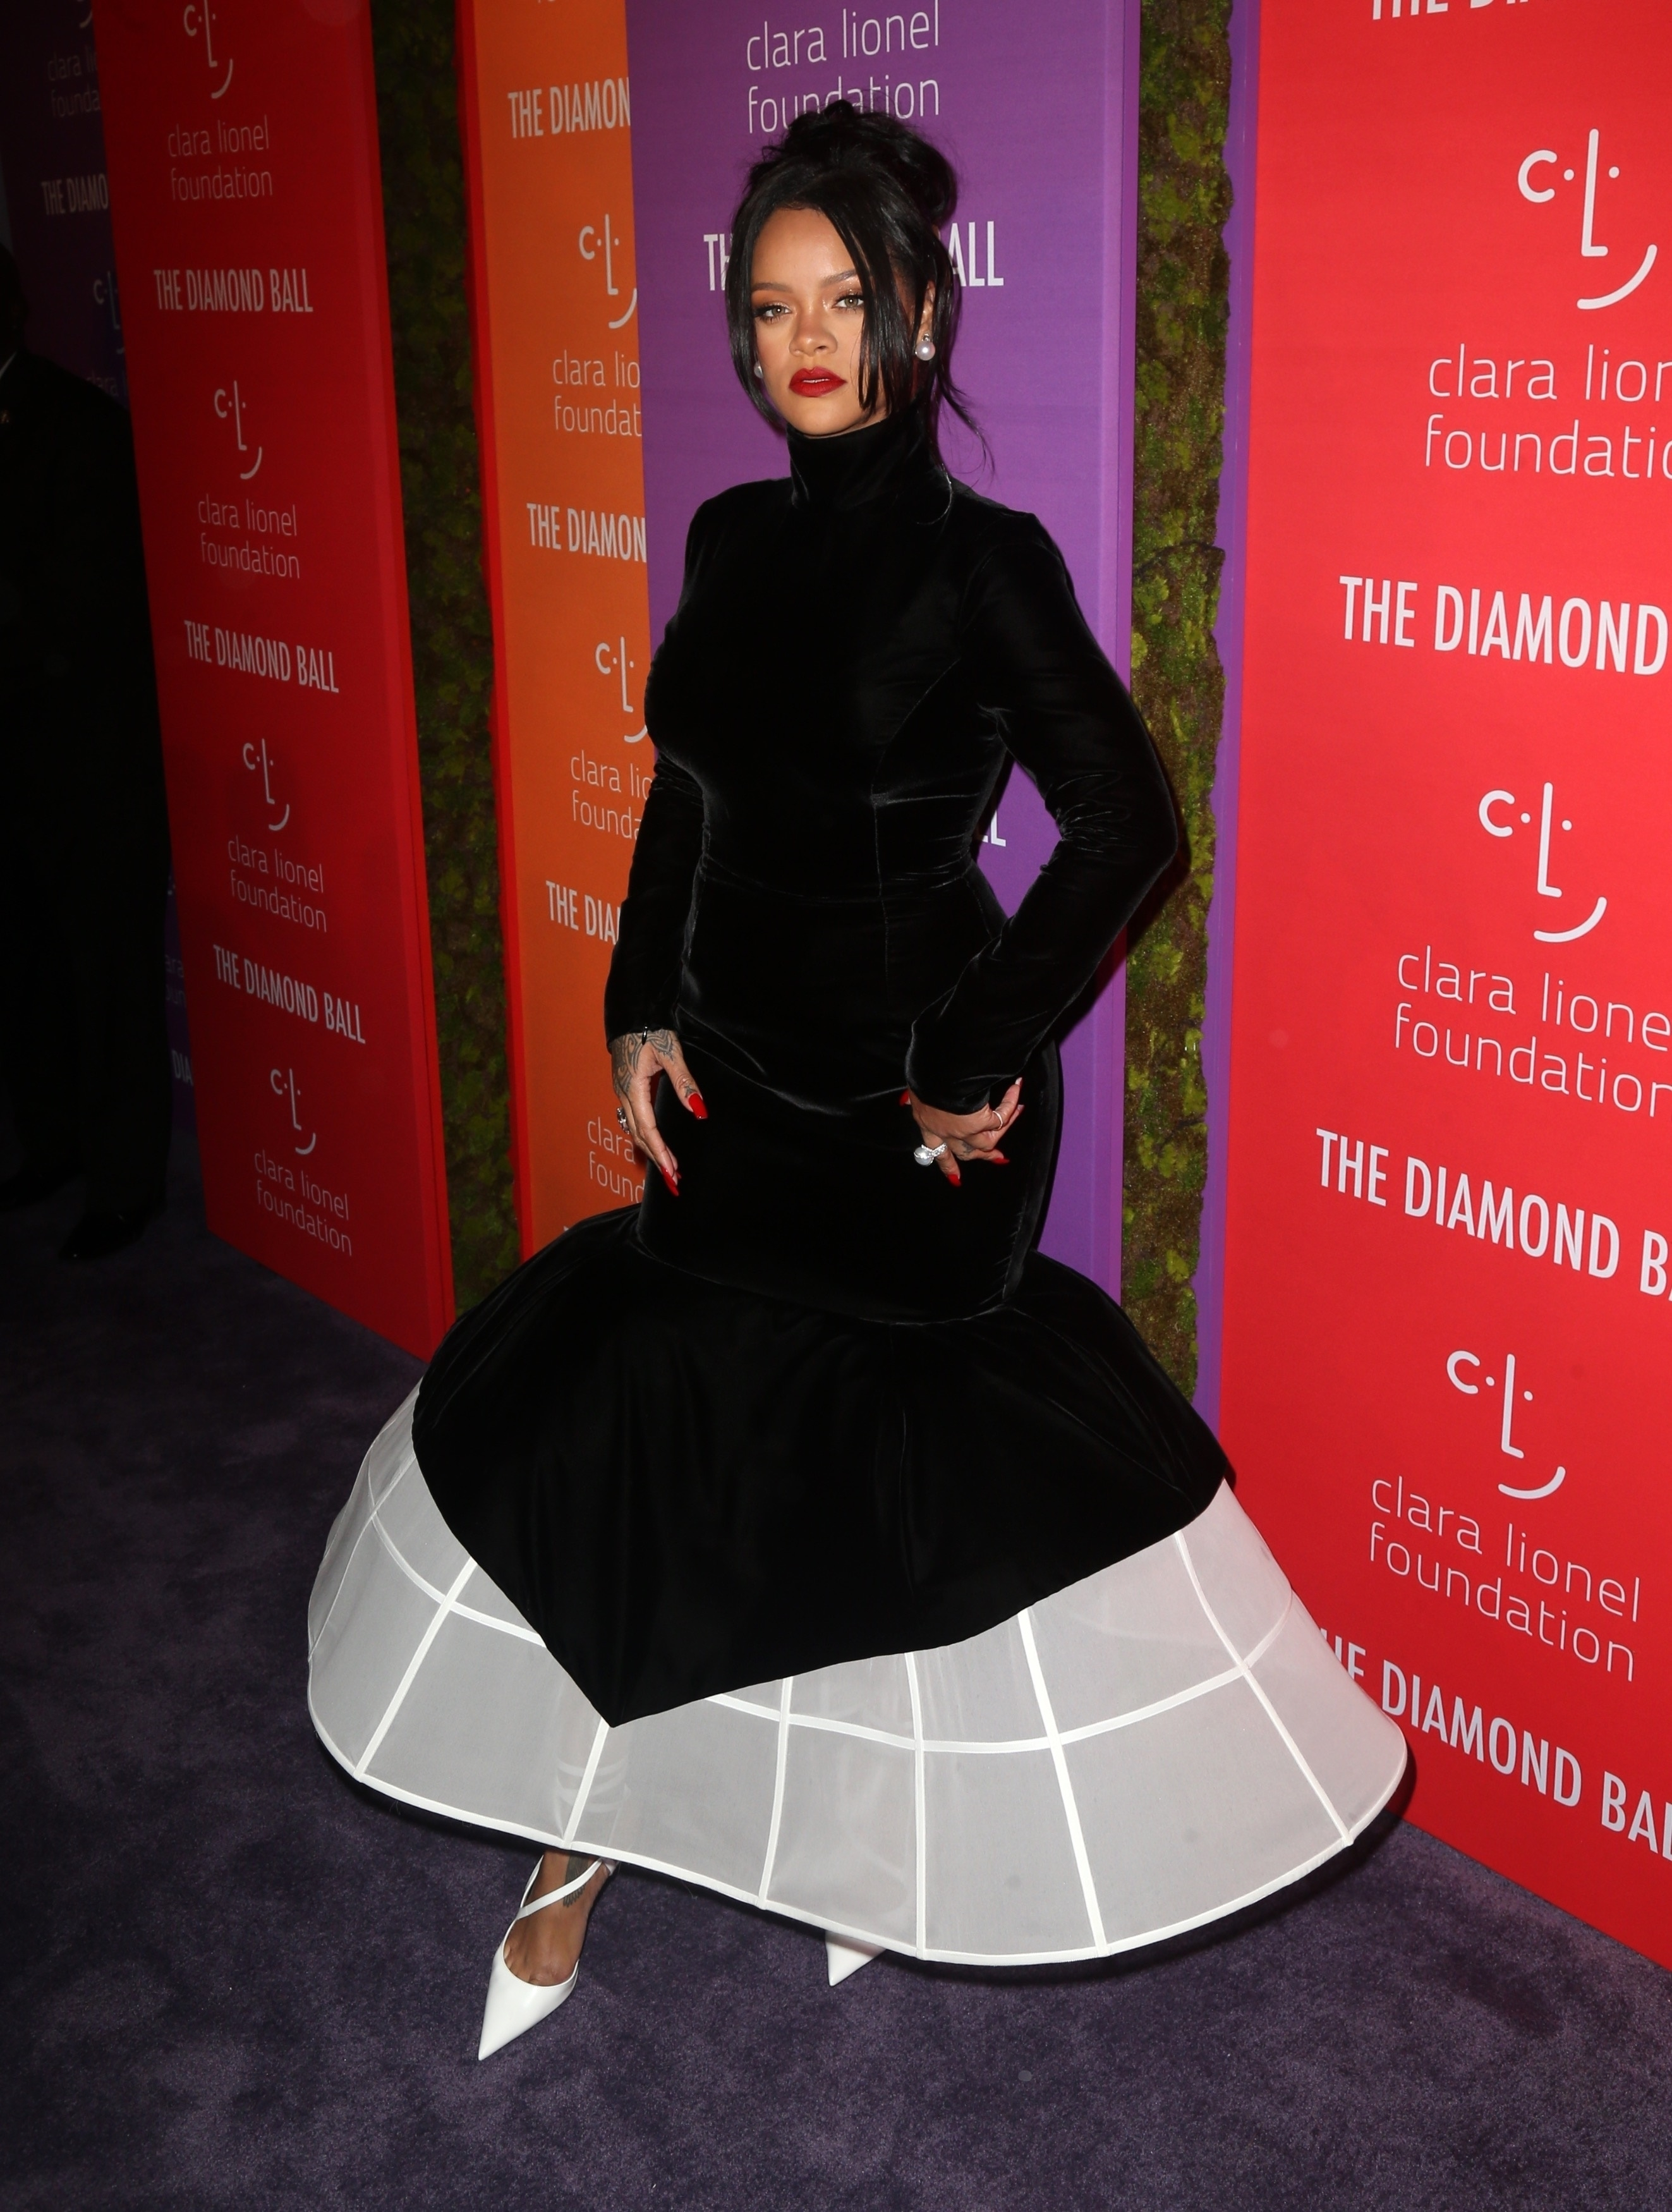 Rihanna at 2019 Diamond Ball in New York on September 12, 2019